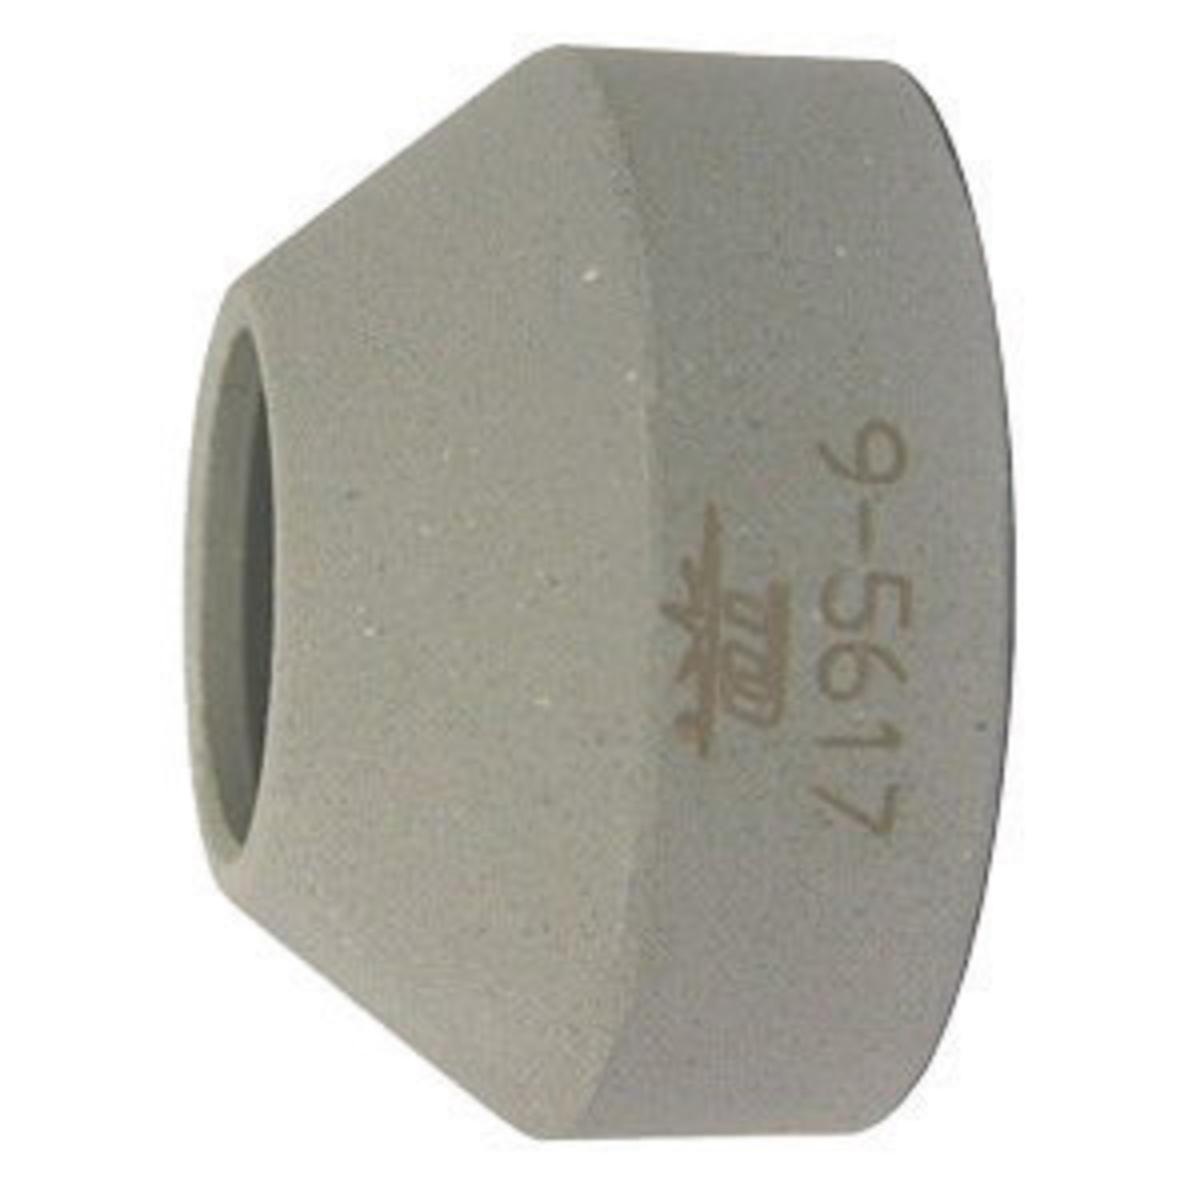 Kunzer DSR109 Startger/ät mit Ultra Kompensator 800CCA